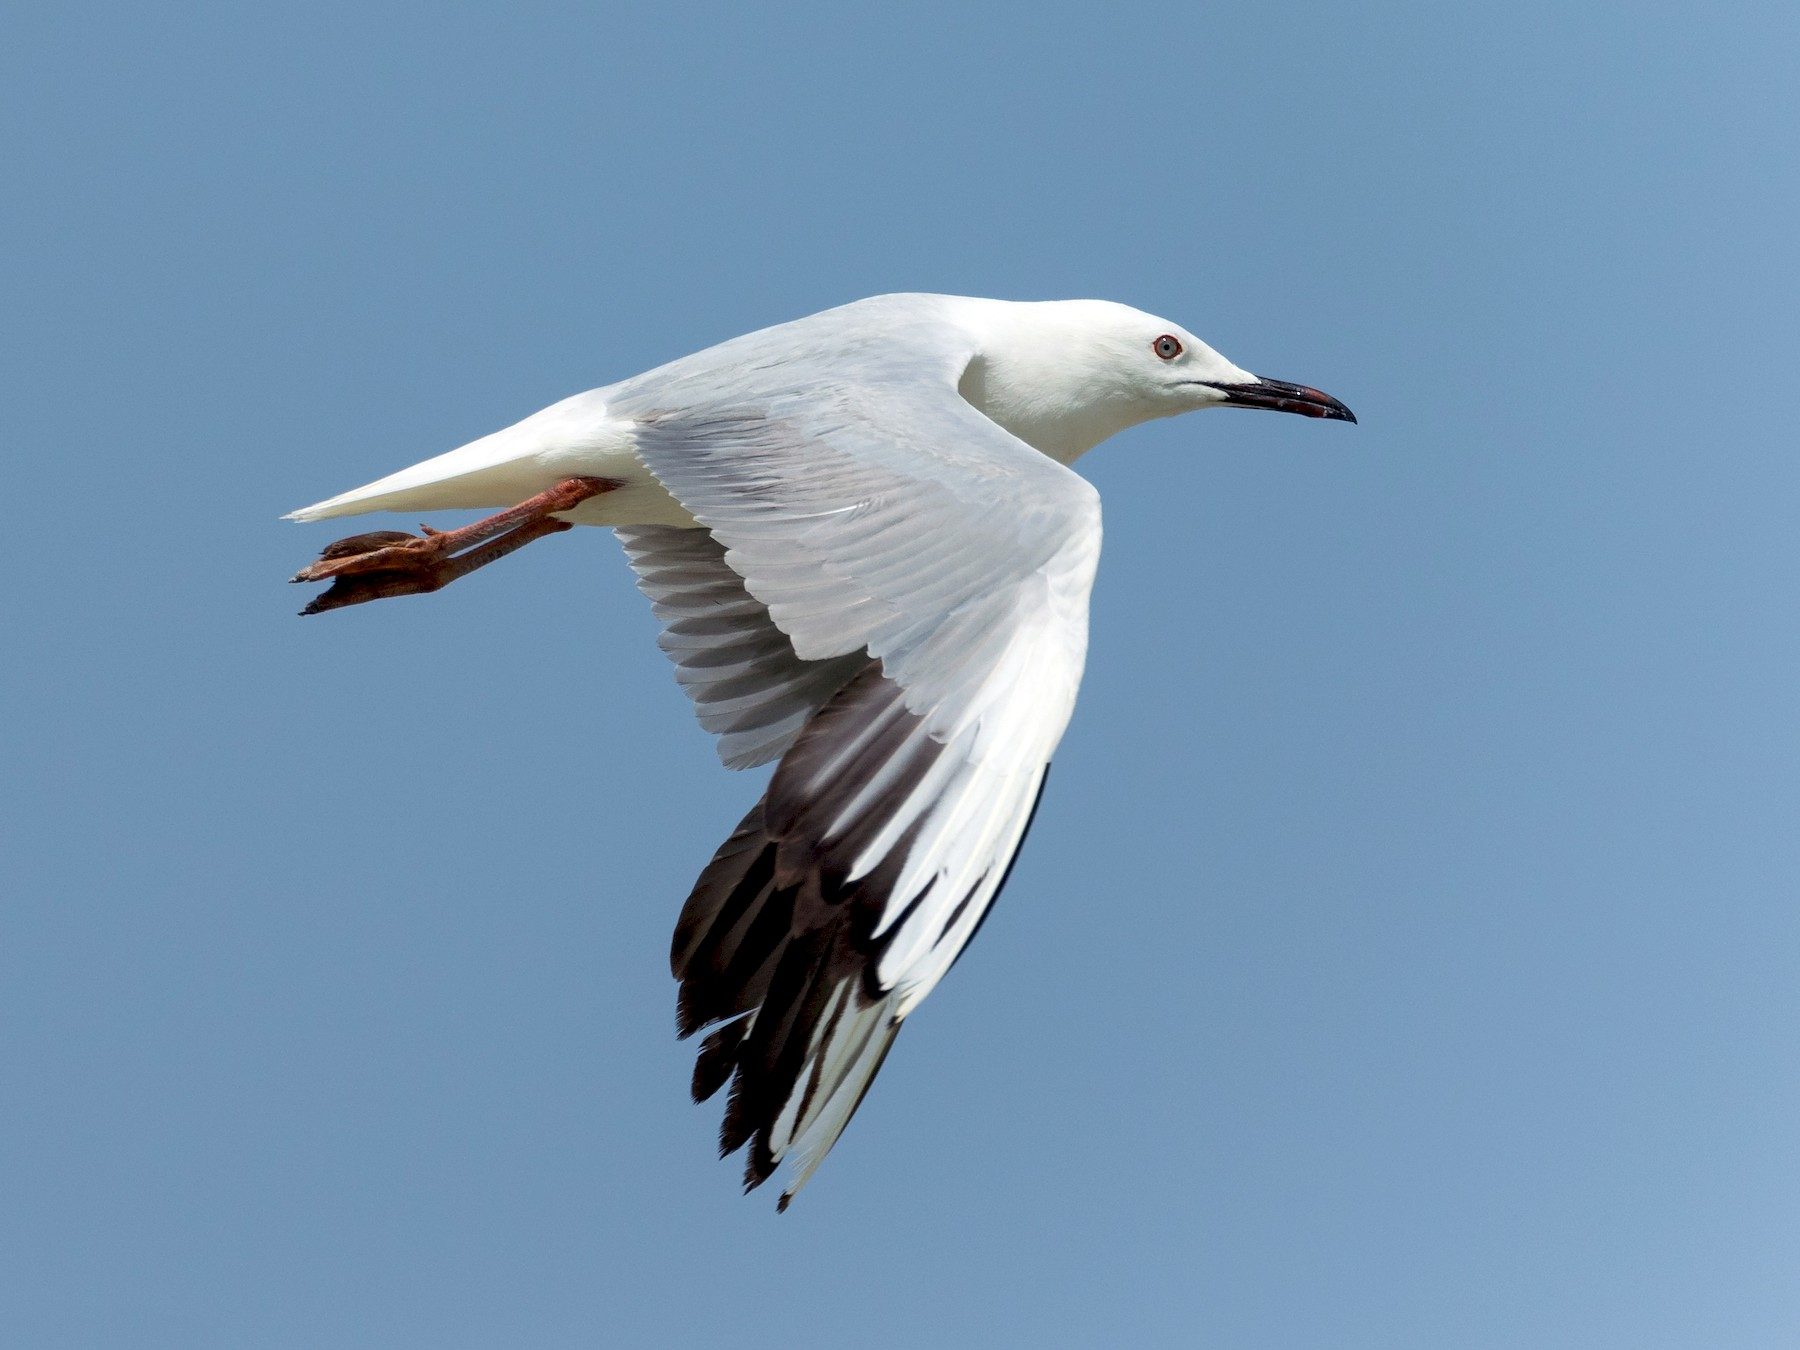 Slender-billed Gull - Markus Craig